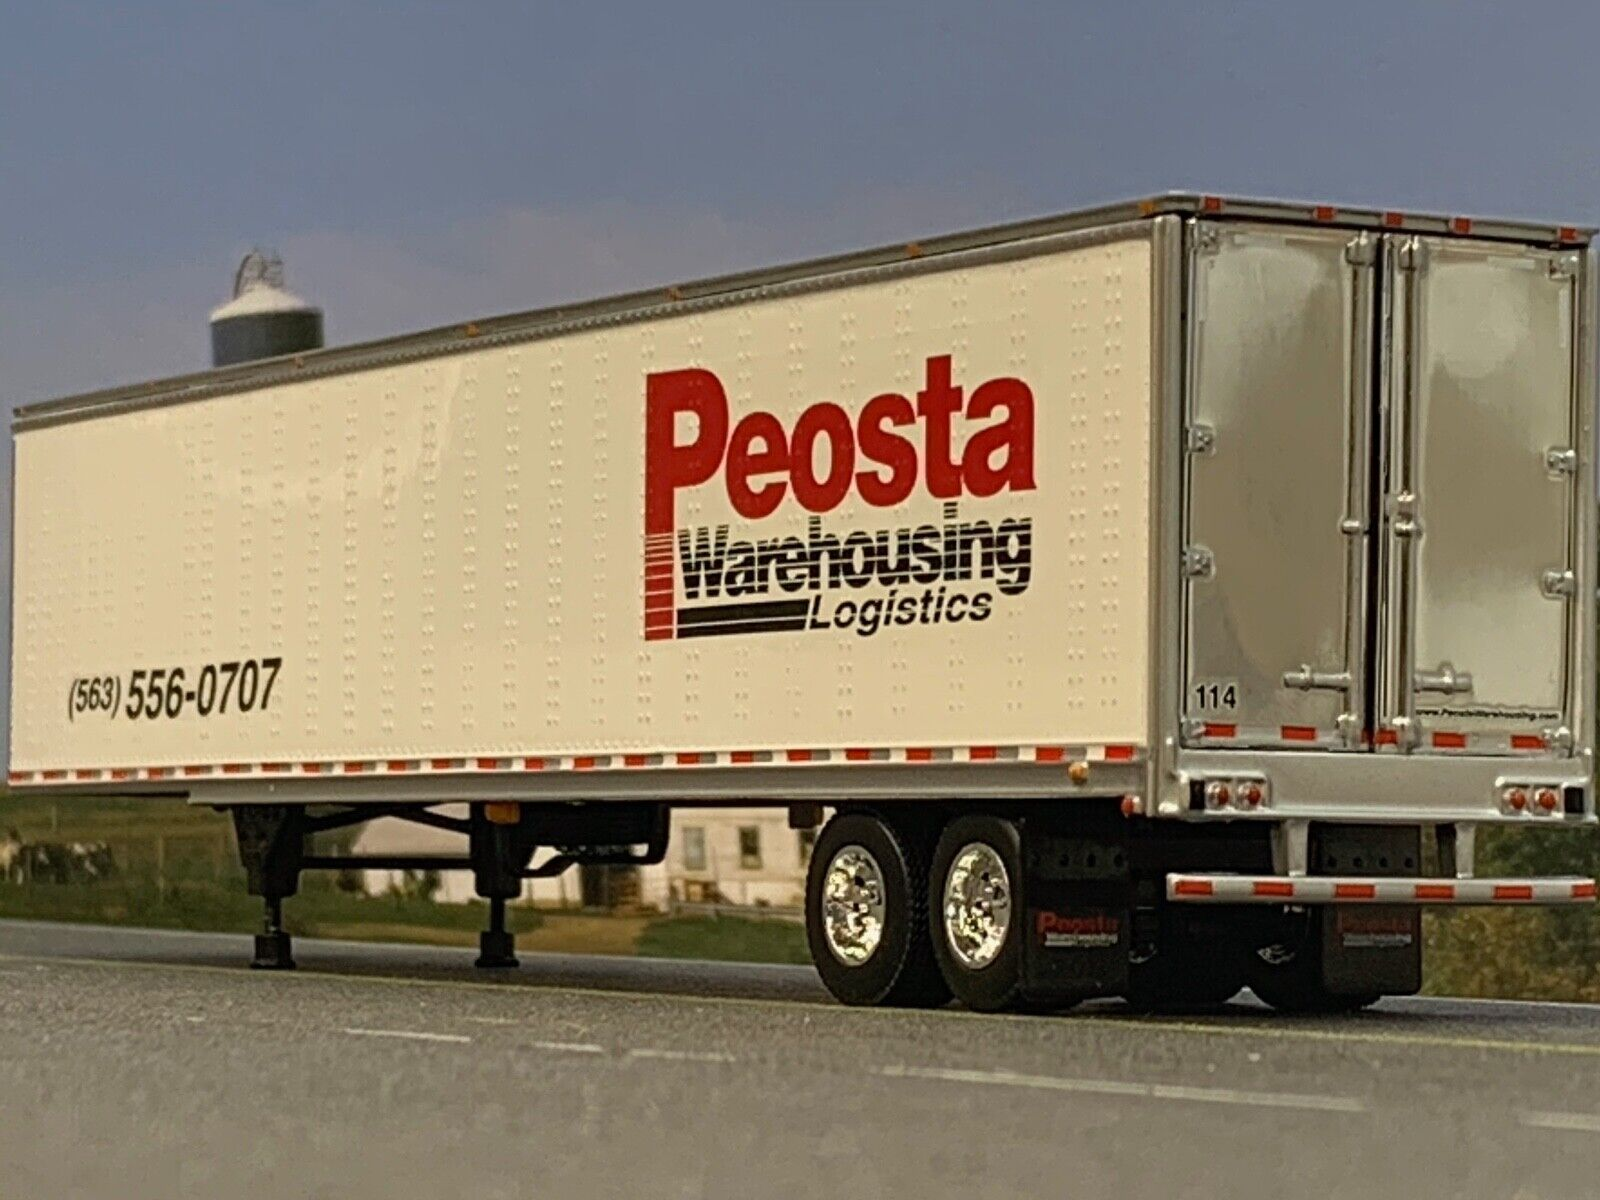 1/64 DCP PEOSTA WAREHOUSING 53' UTILITY 3000D-X DRY VAN TRAILER 1